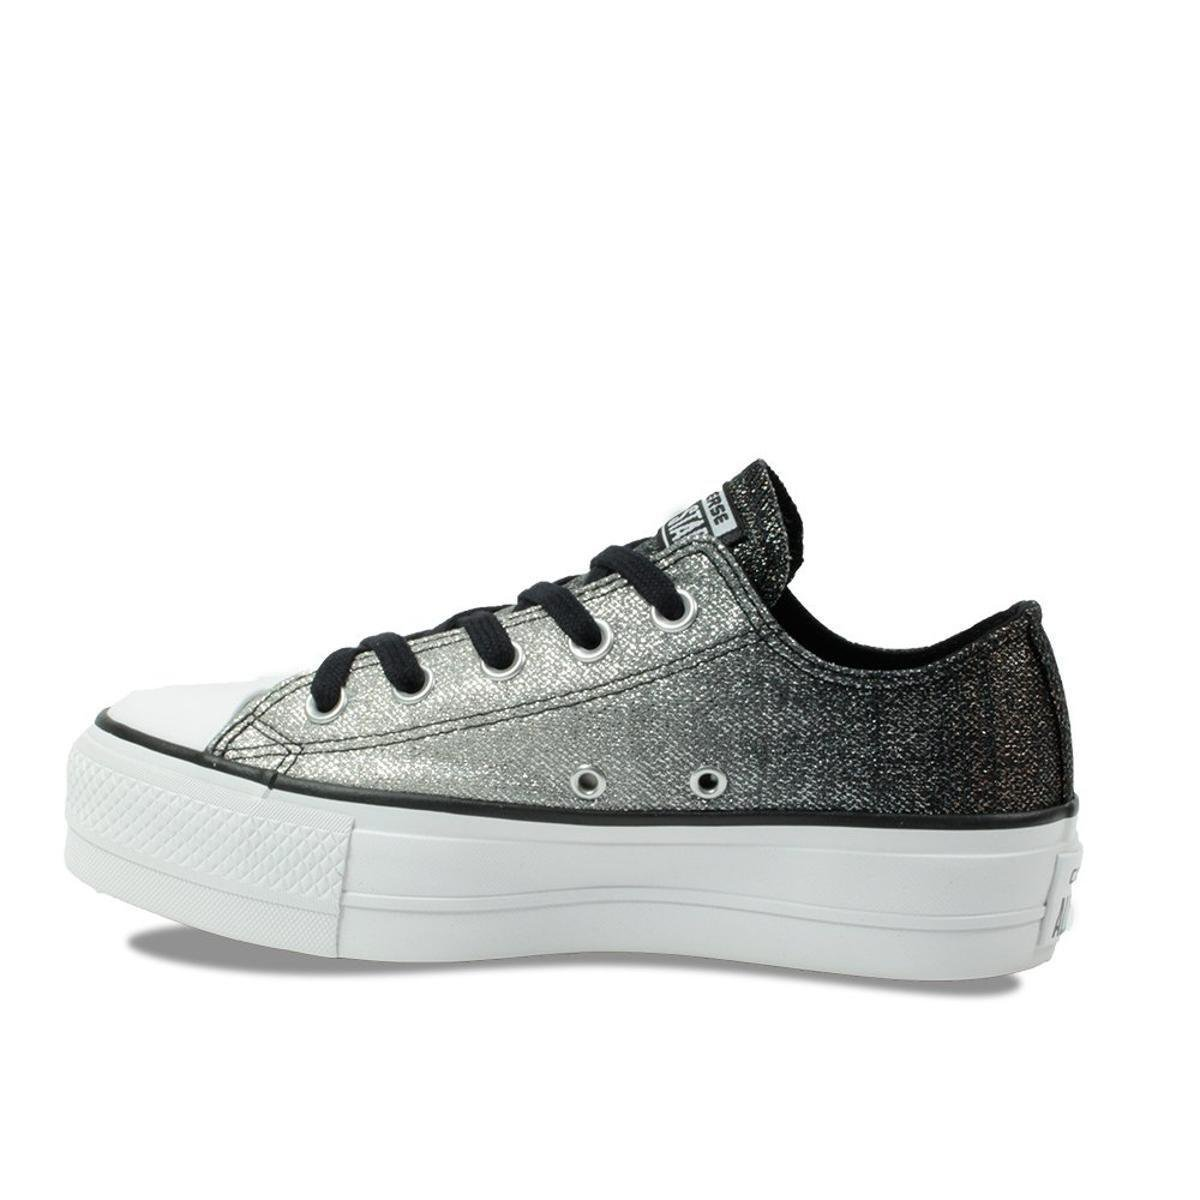 Tênis Converse Chuck Taylor All Star Platform Ox Feminino - Compre ... 320ac0b2d89af